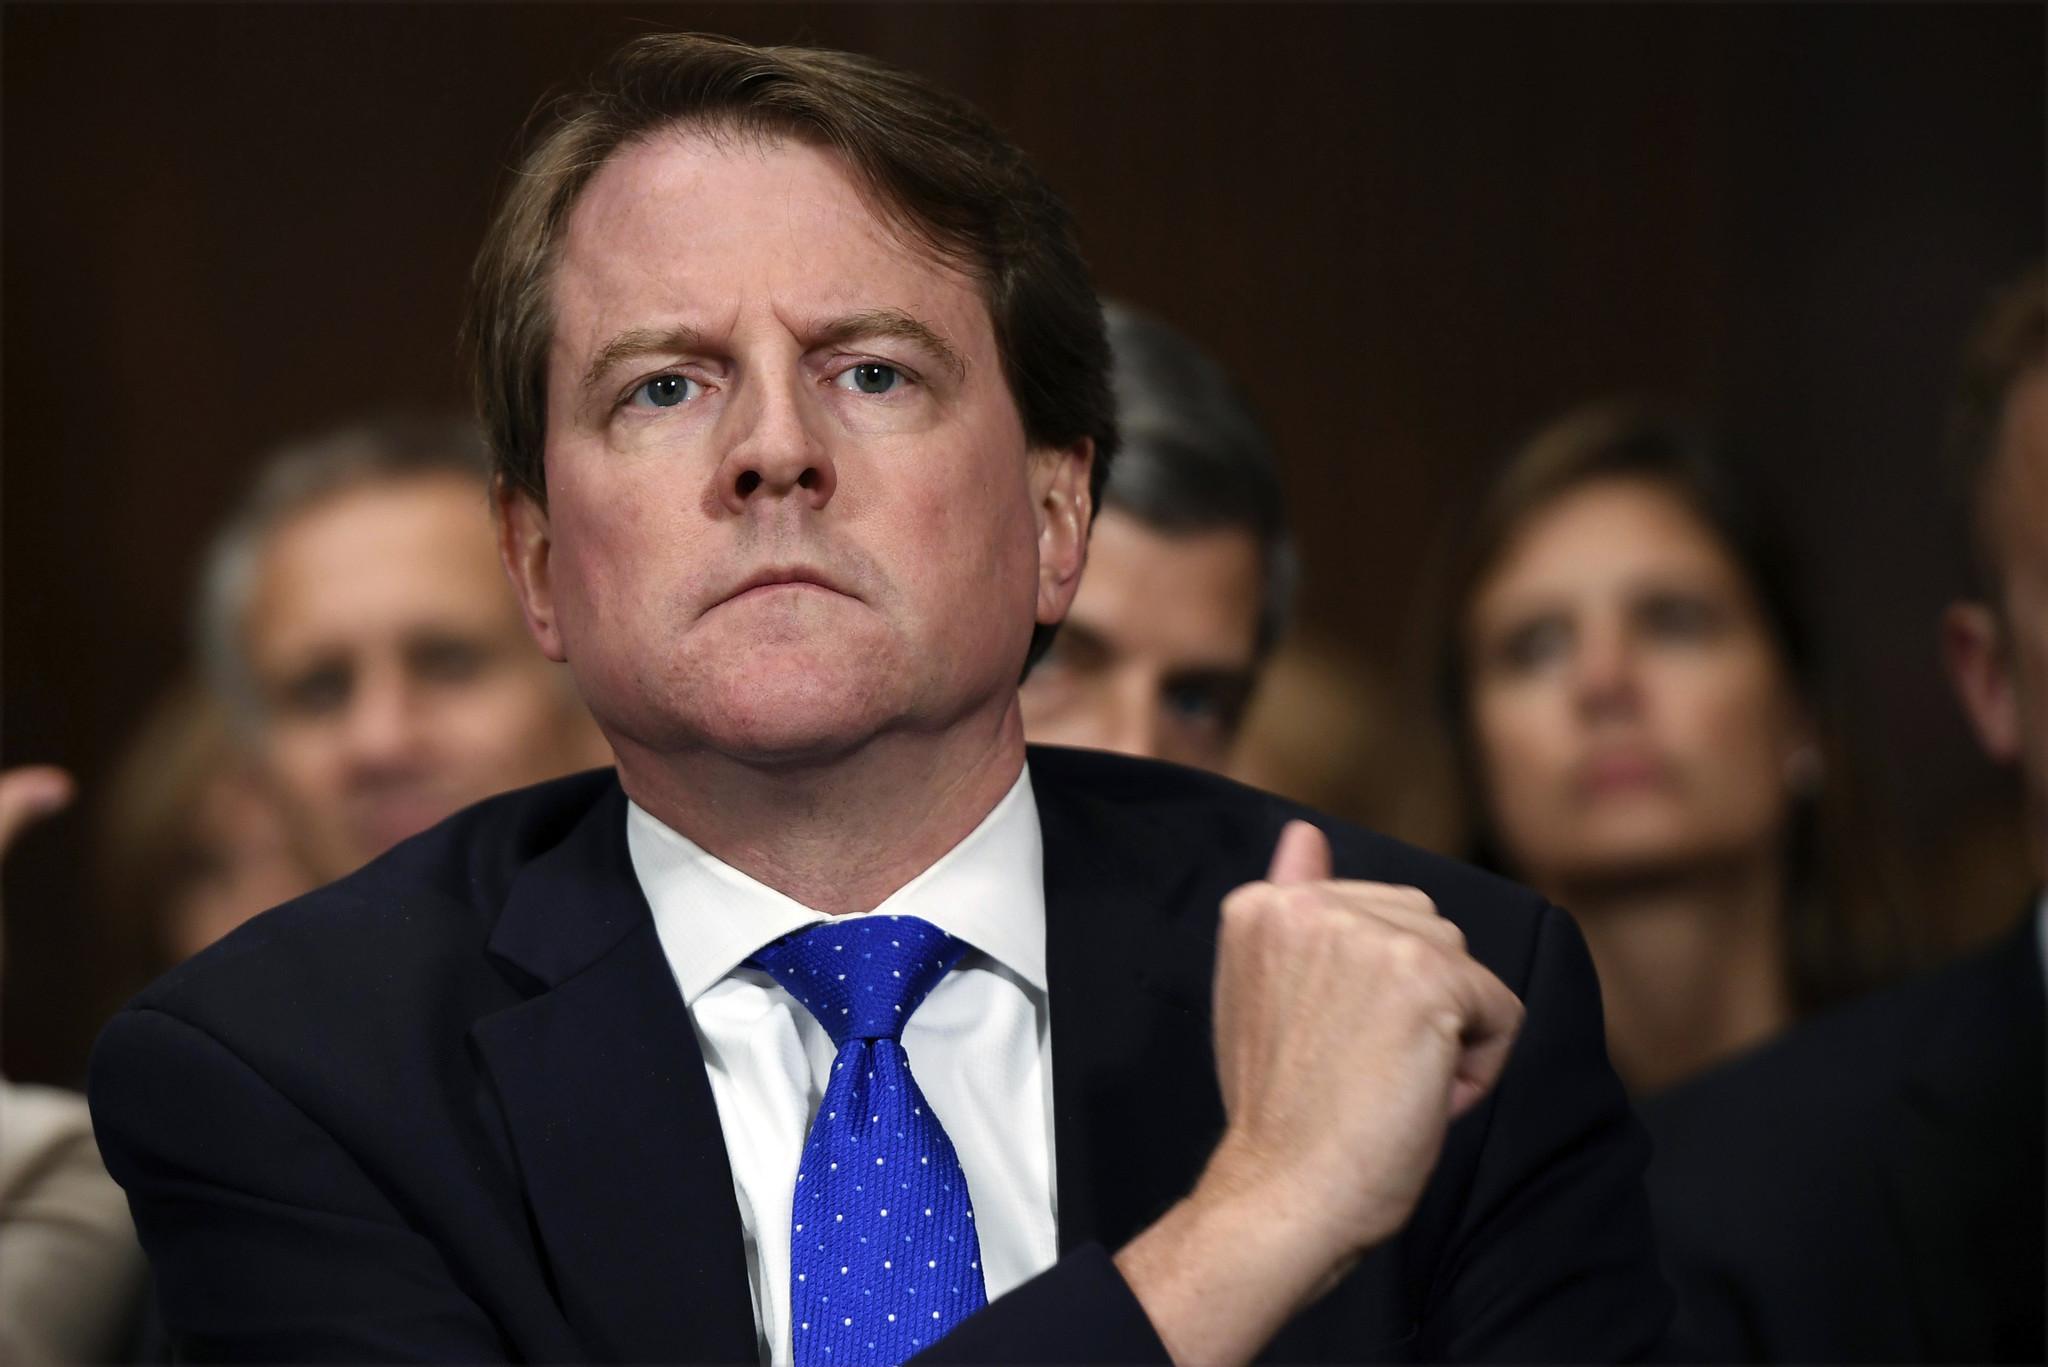 Democrats subpoena former White House Counsel Don McGahn, but downplay Trump impeachment talk